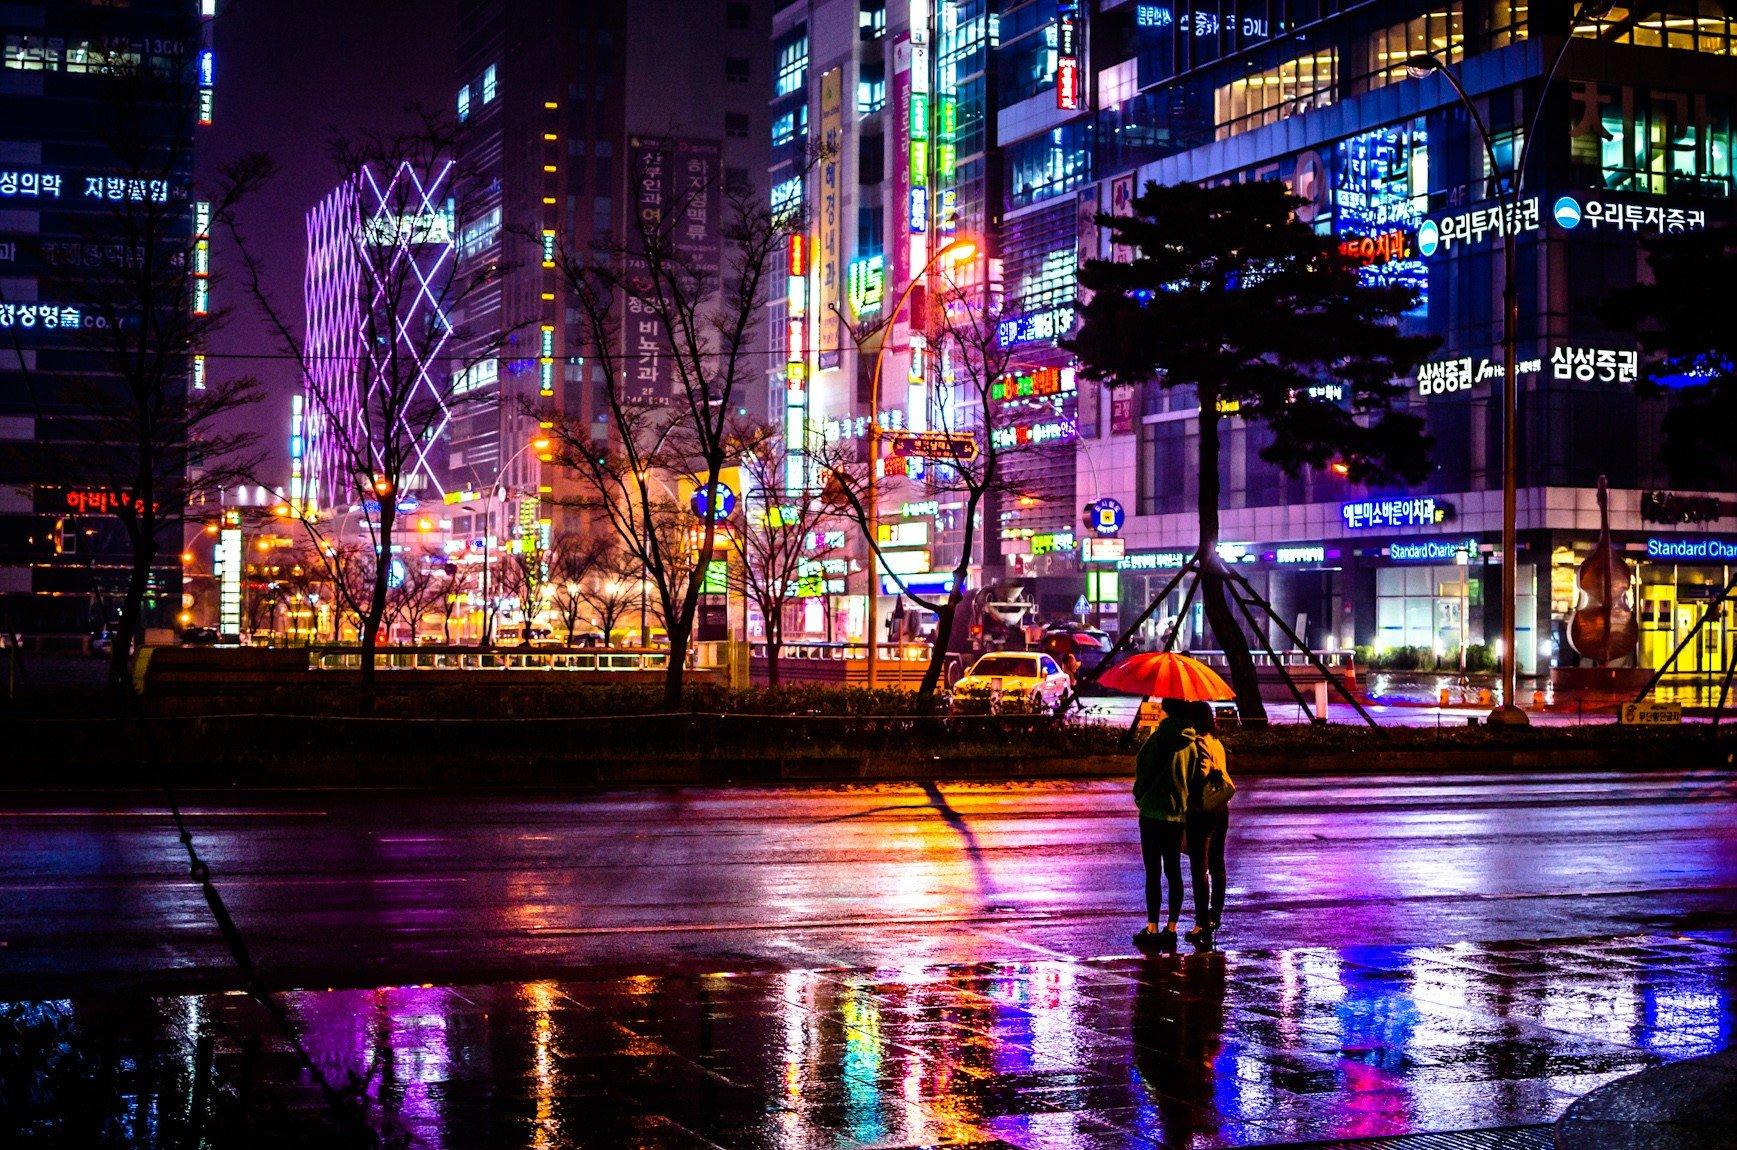 Korea Wallpaper: Cityscape, Umbrella, South Korea HD Wallpapers / Desktop